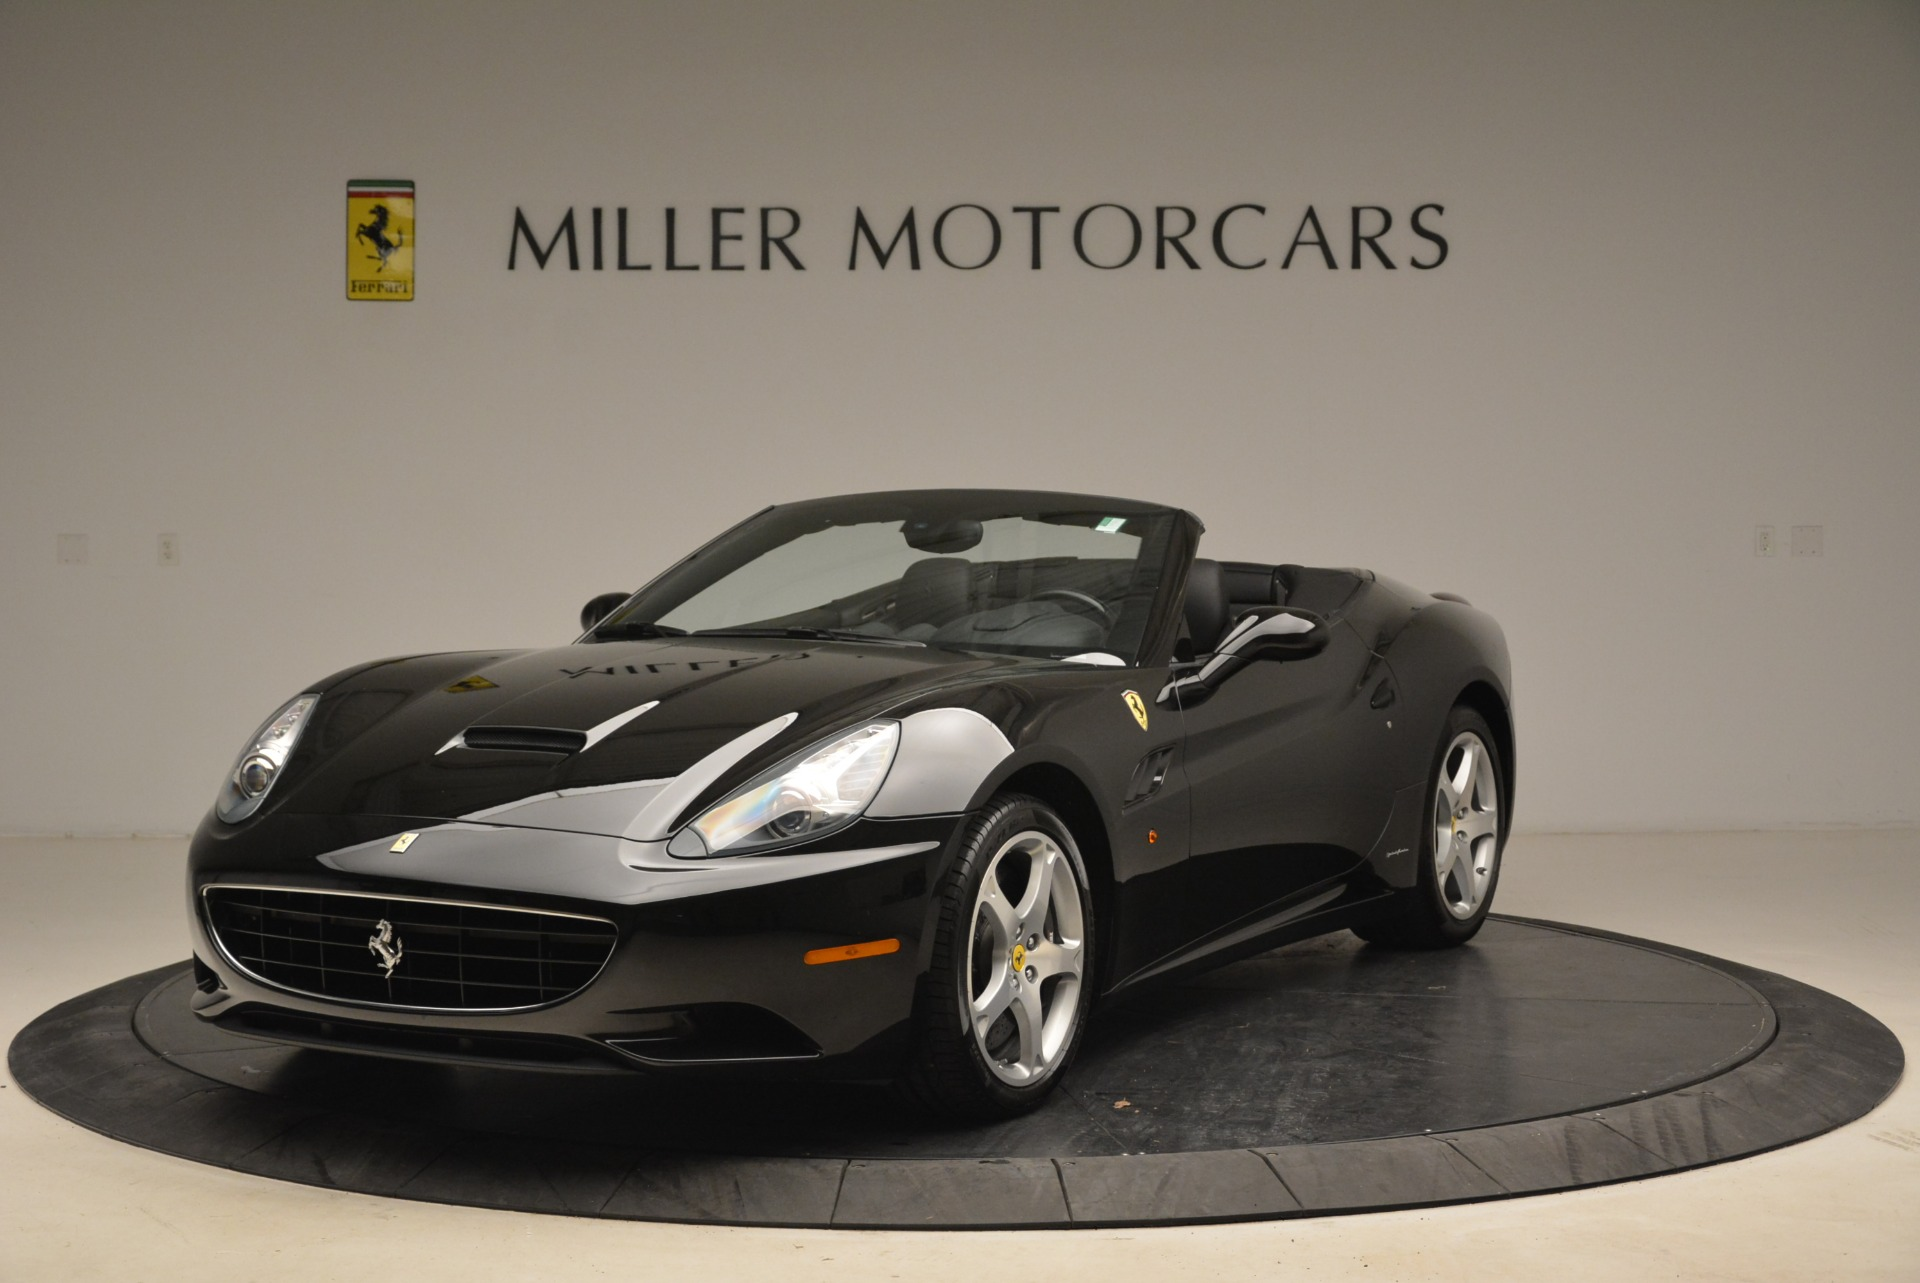 Used 2009 Ferrari California for sale Sold at Alfa Romeo of Greenwich in Greenwich CT 06830 1